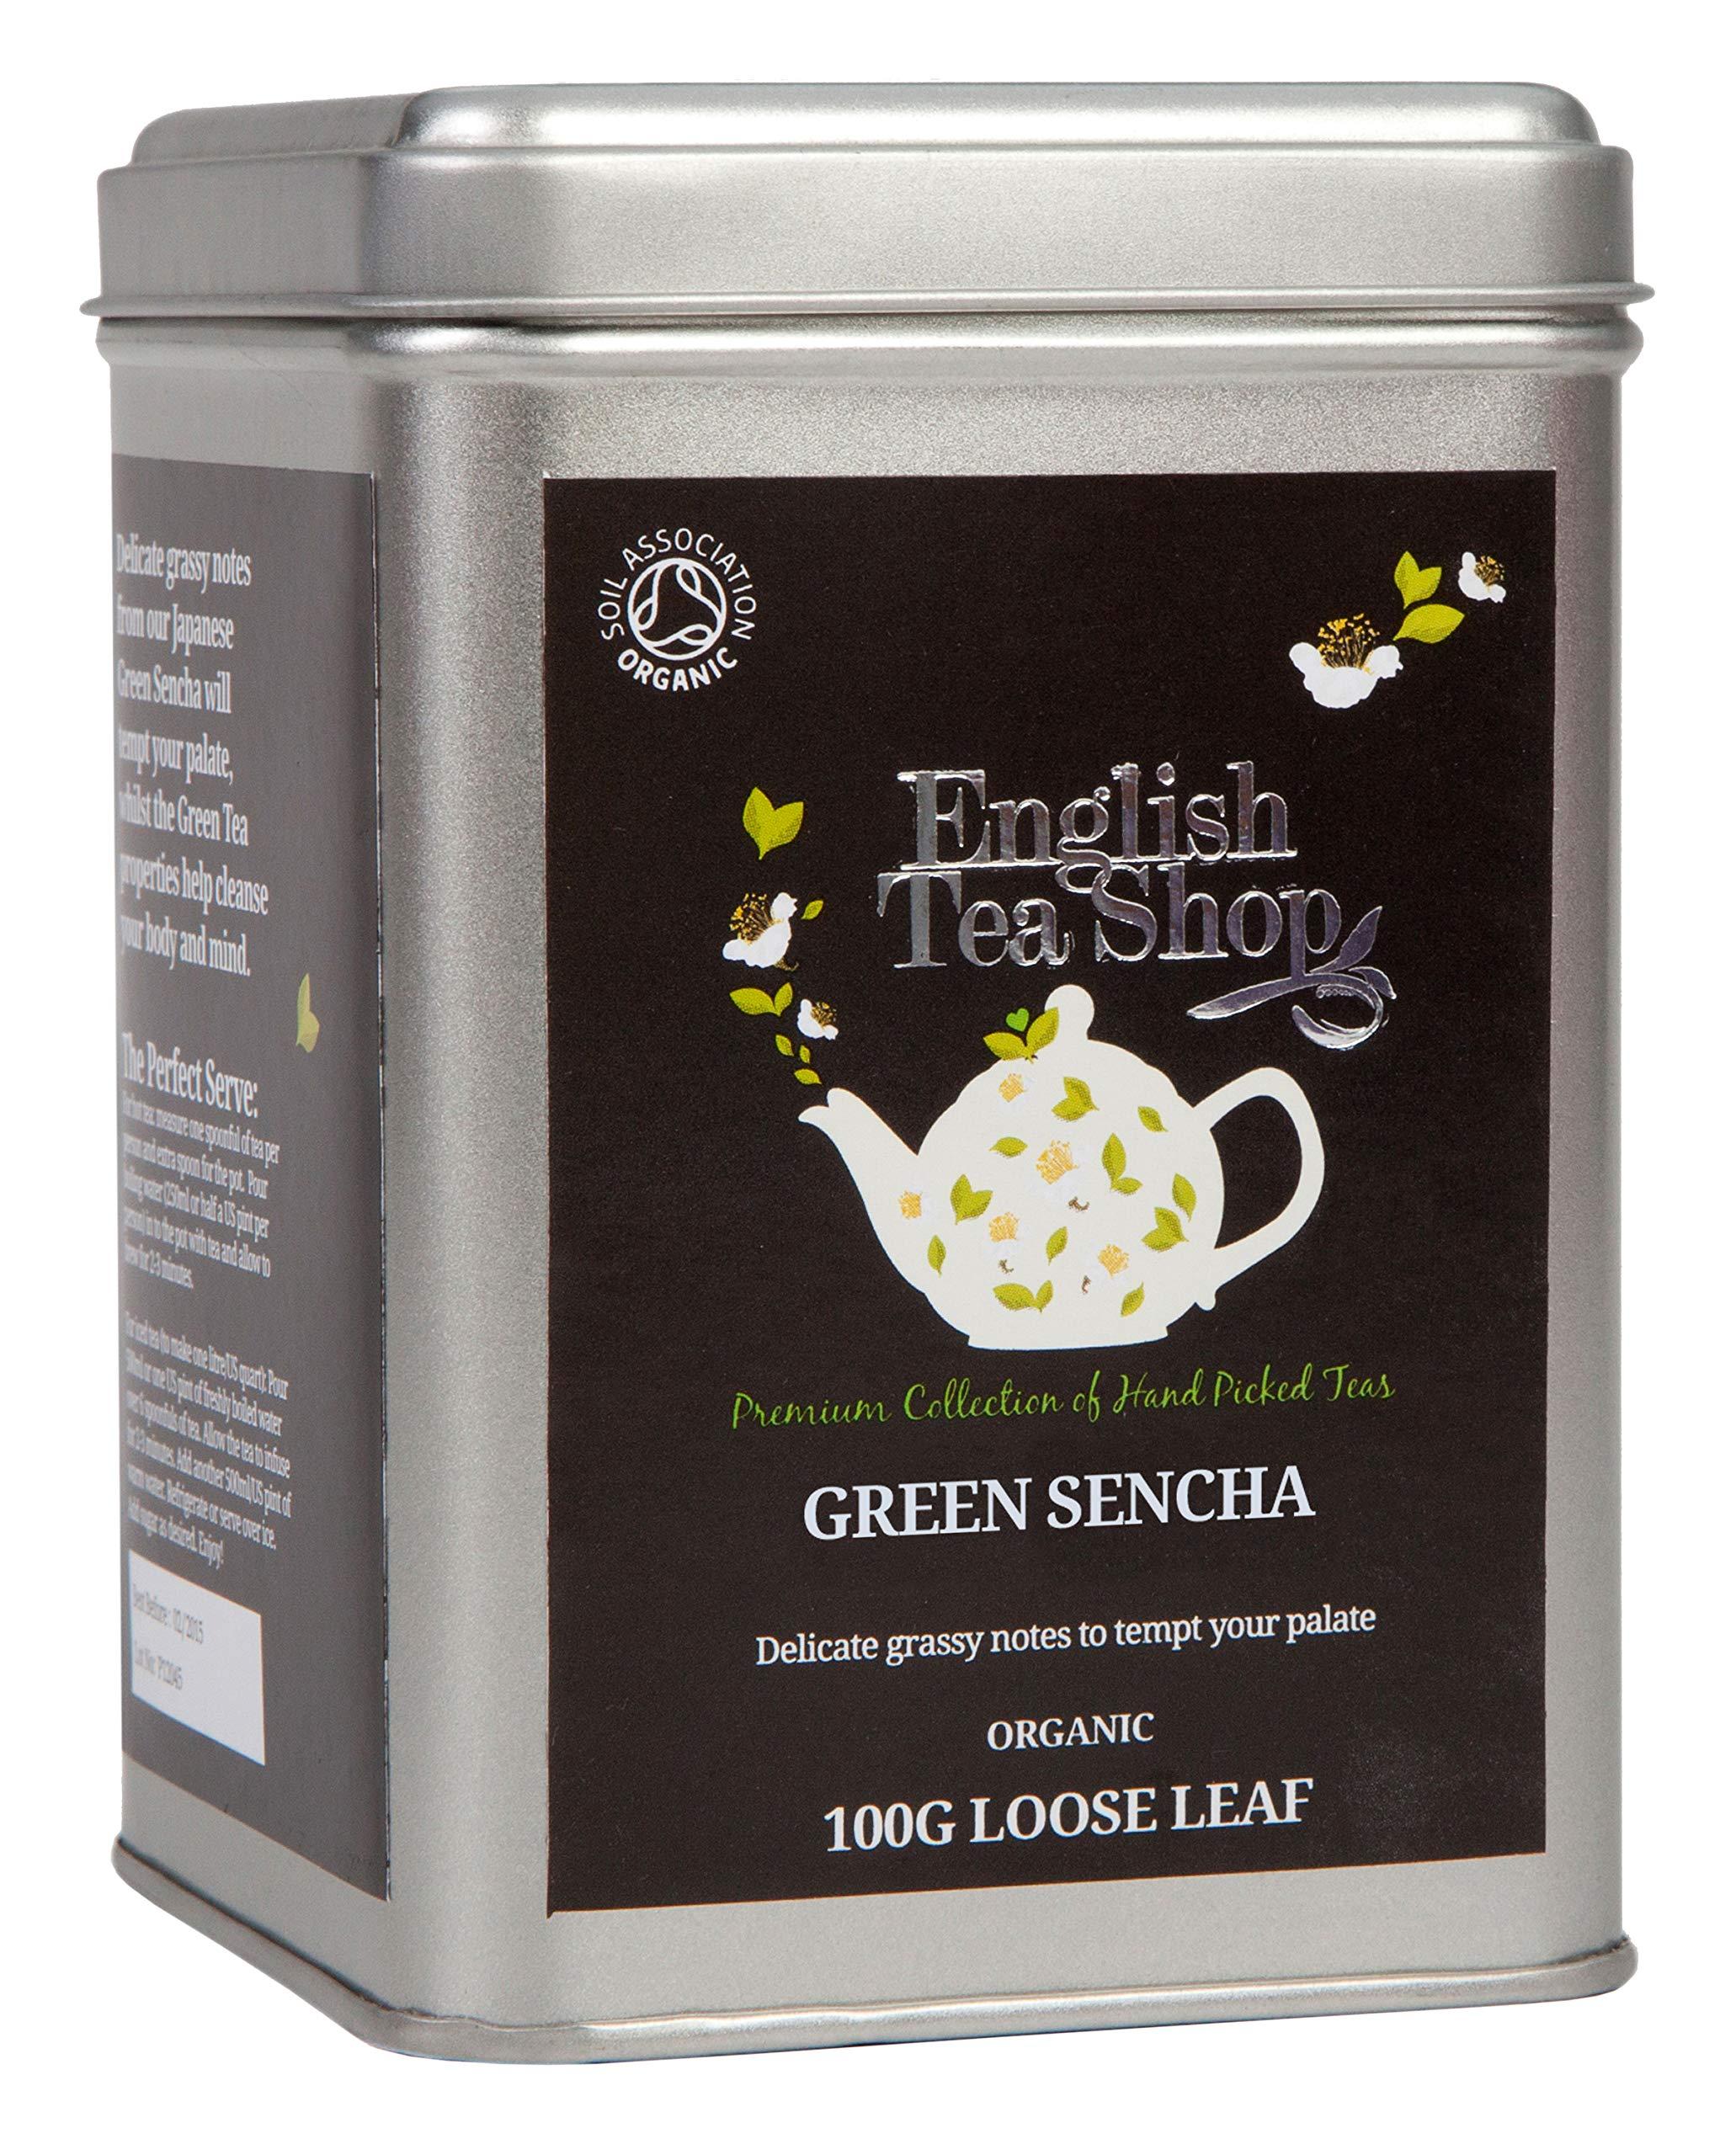 English Tea Shop Organic Green Sencha - 100g Loose leaf tea in a Tin